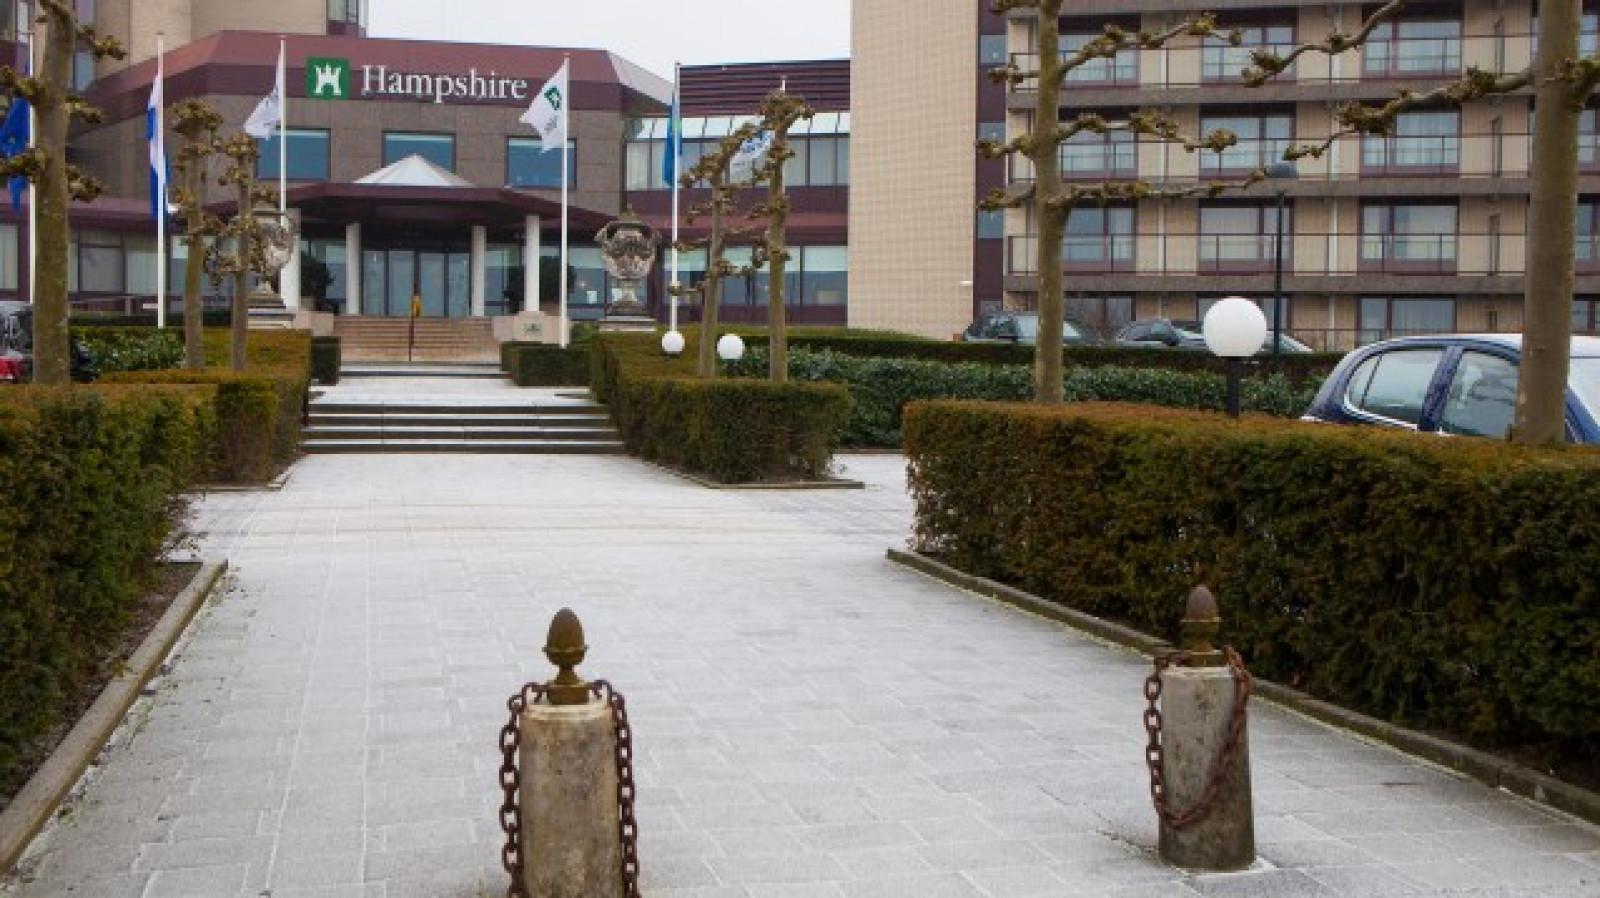 Hampshire Newport Huizen : Hampshire hotel u newport huizen starting from eur hotel in